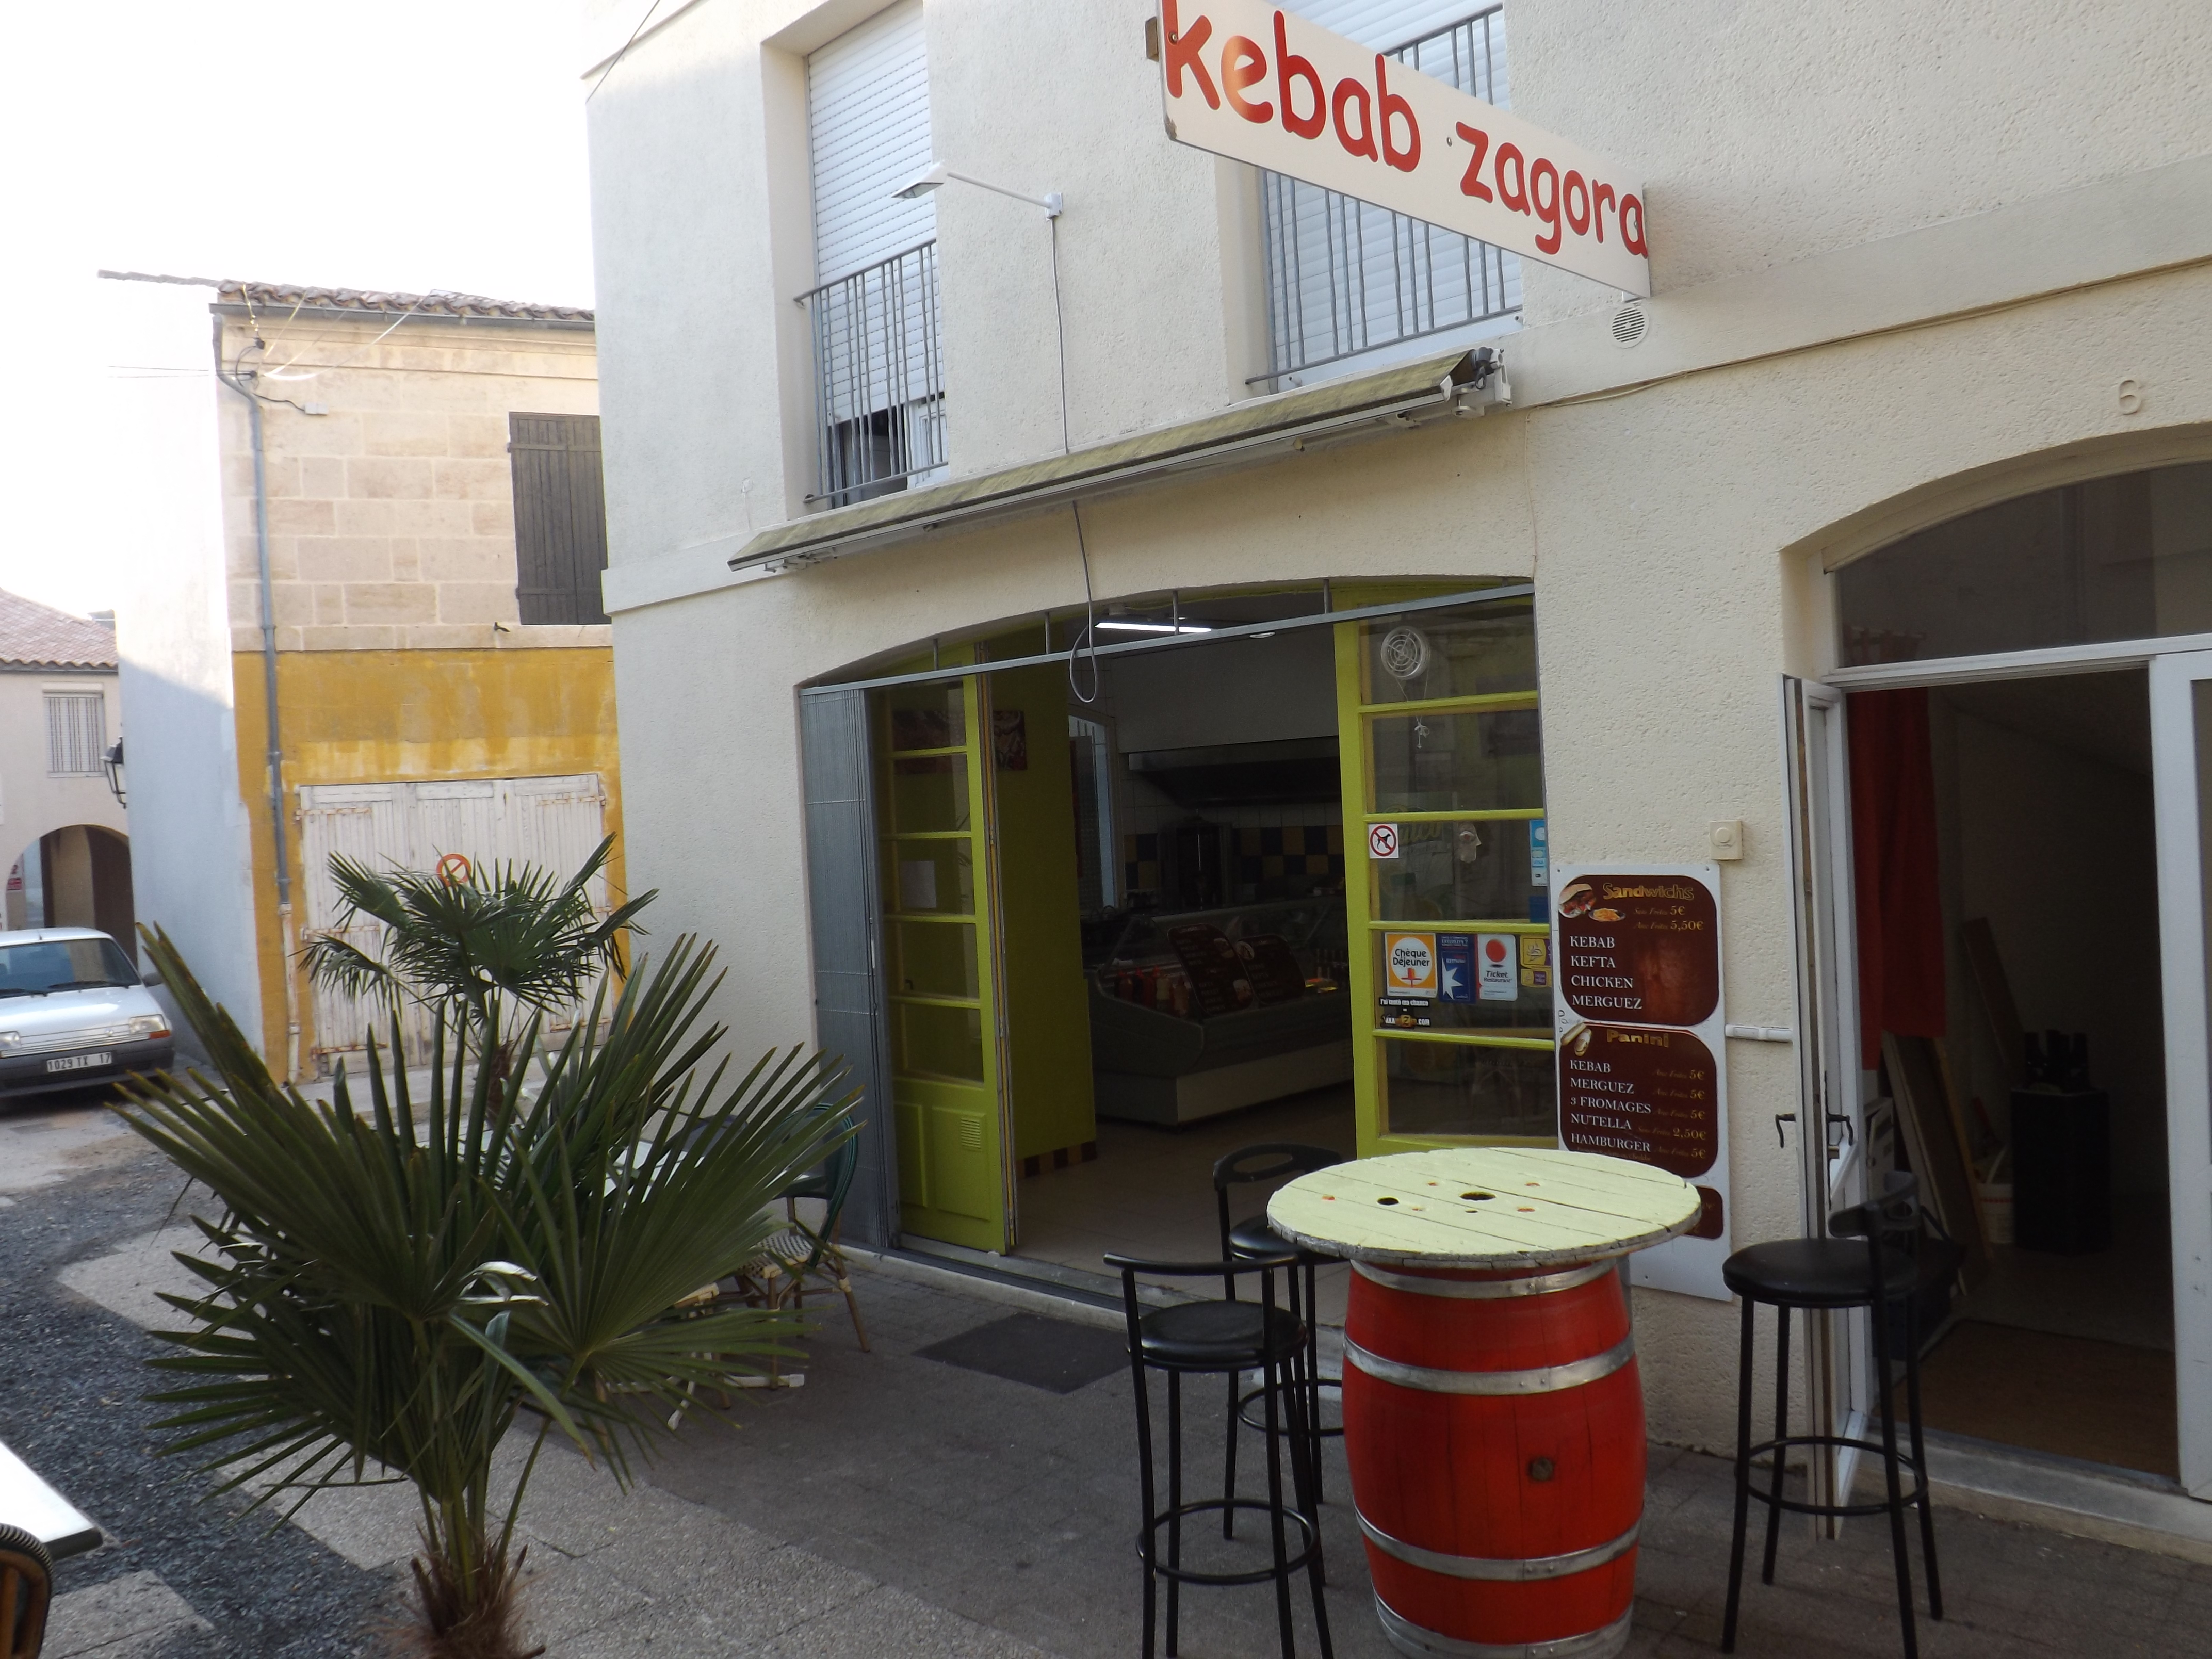 Kebab Zagora à Surgères